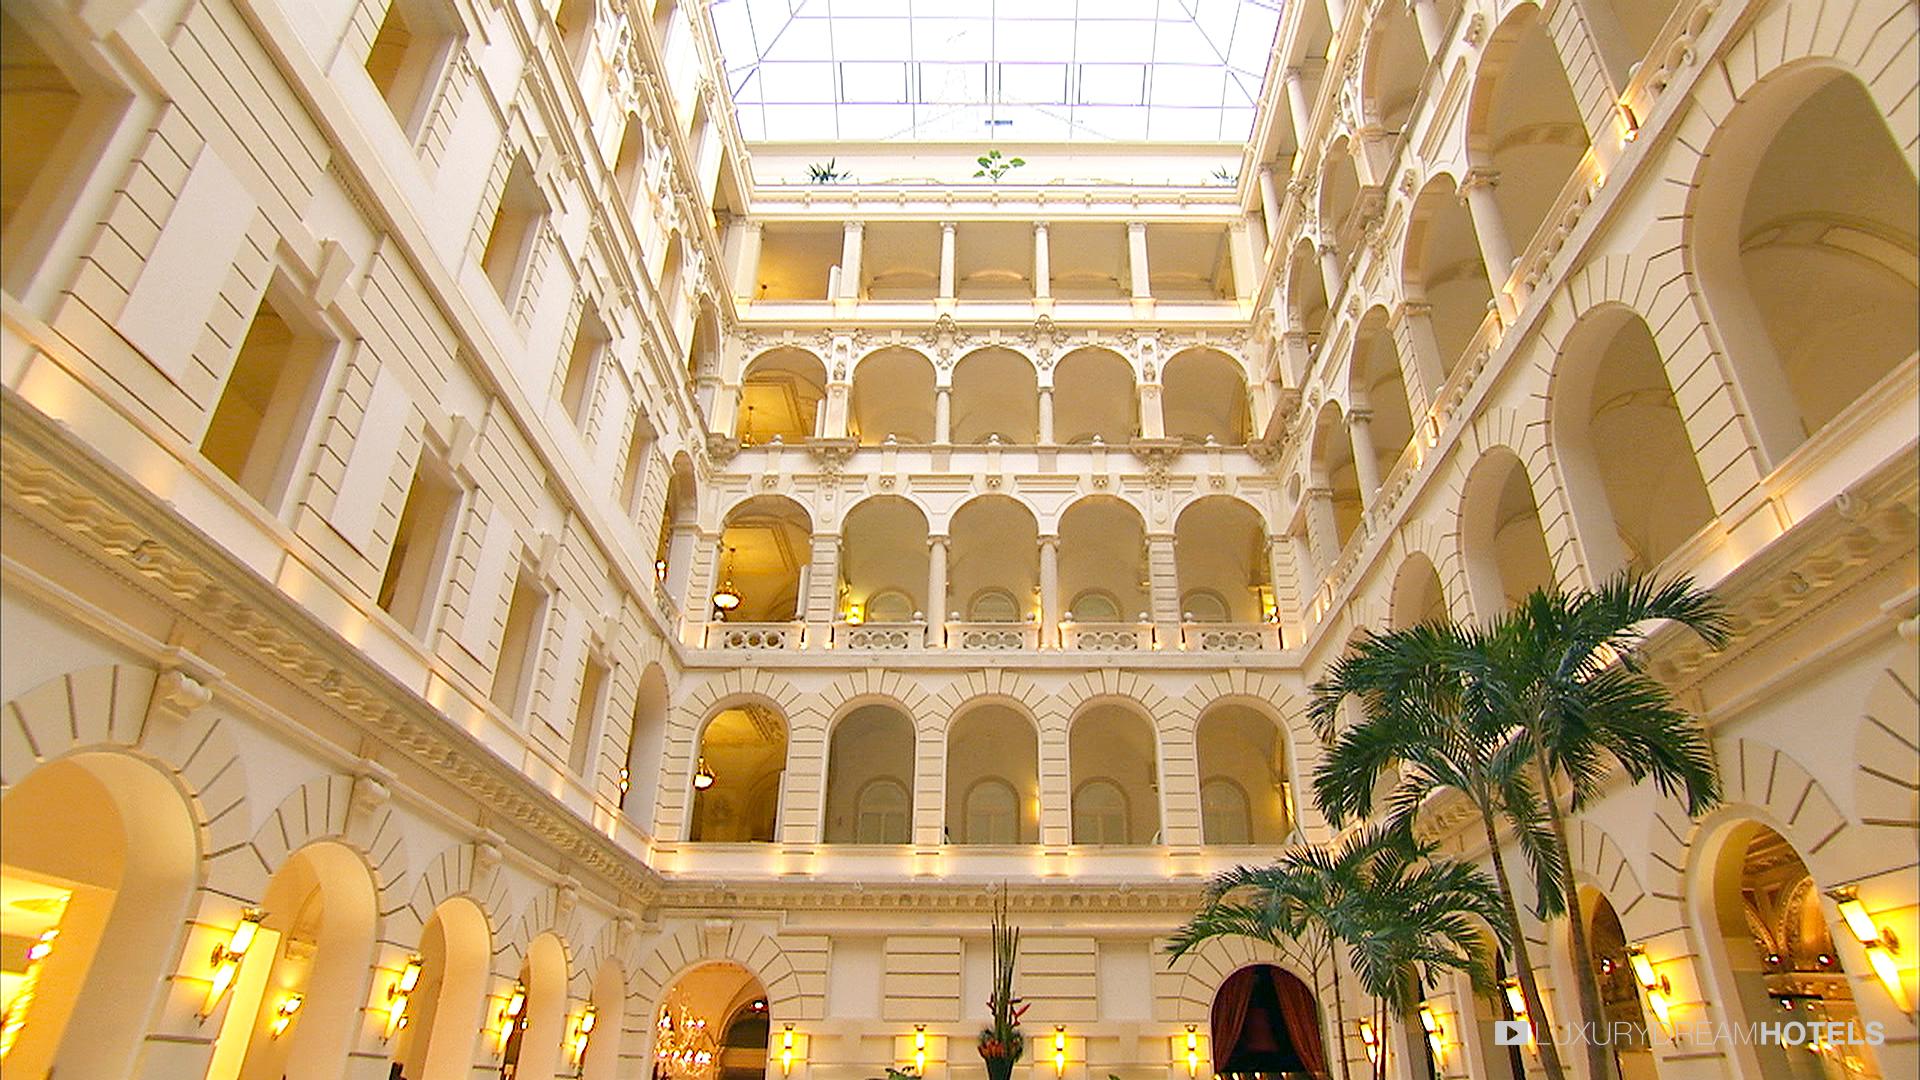 hotell boscolo budapest